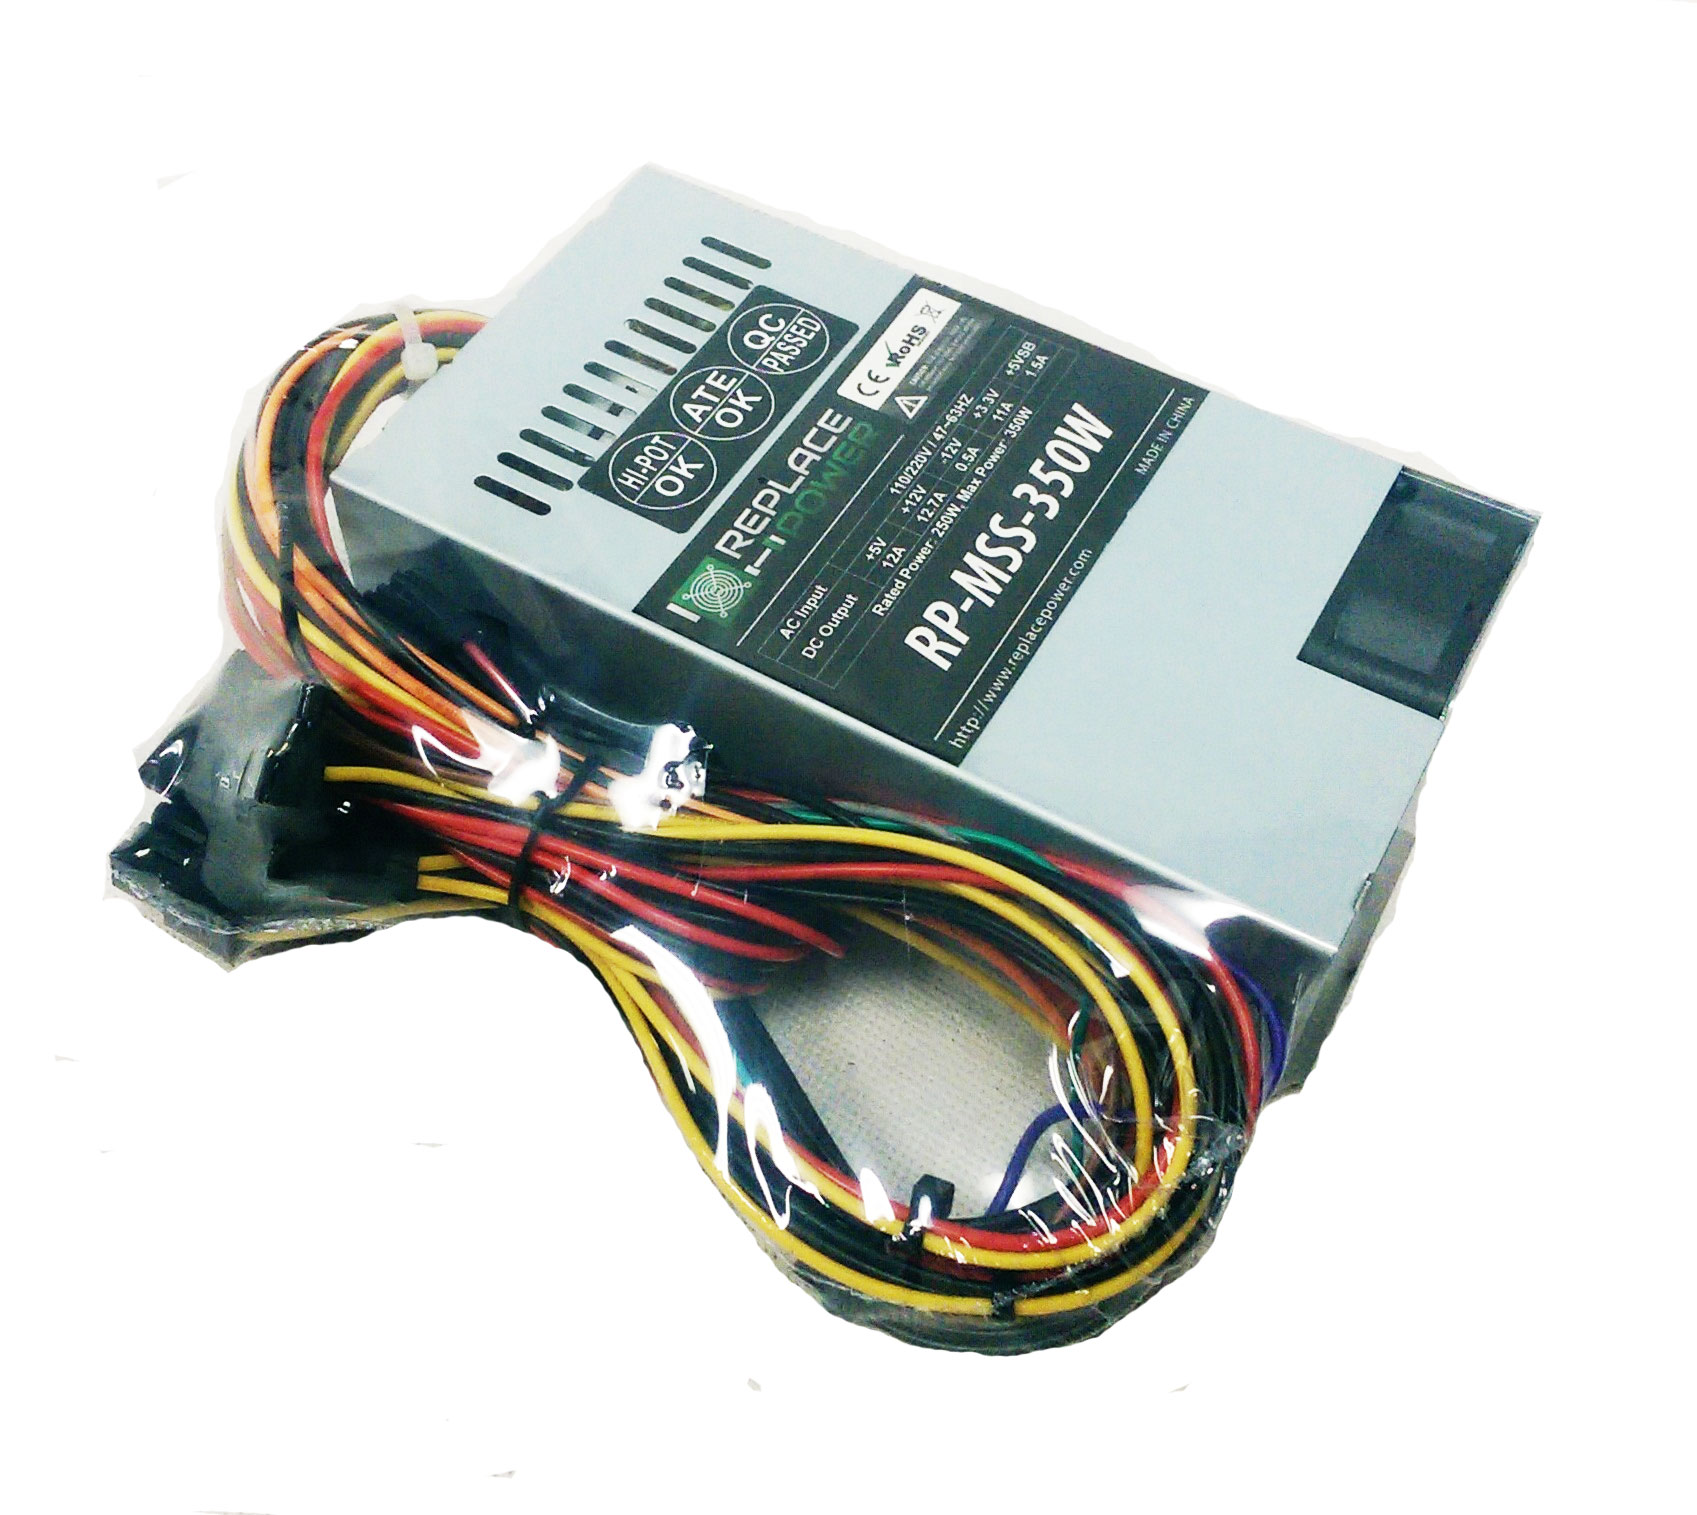 Enhance ENP-2224B ENP-2224B/_2G 350W Power Supply Replace//Upgrade TC35.2